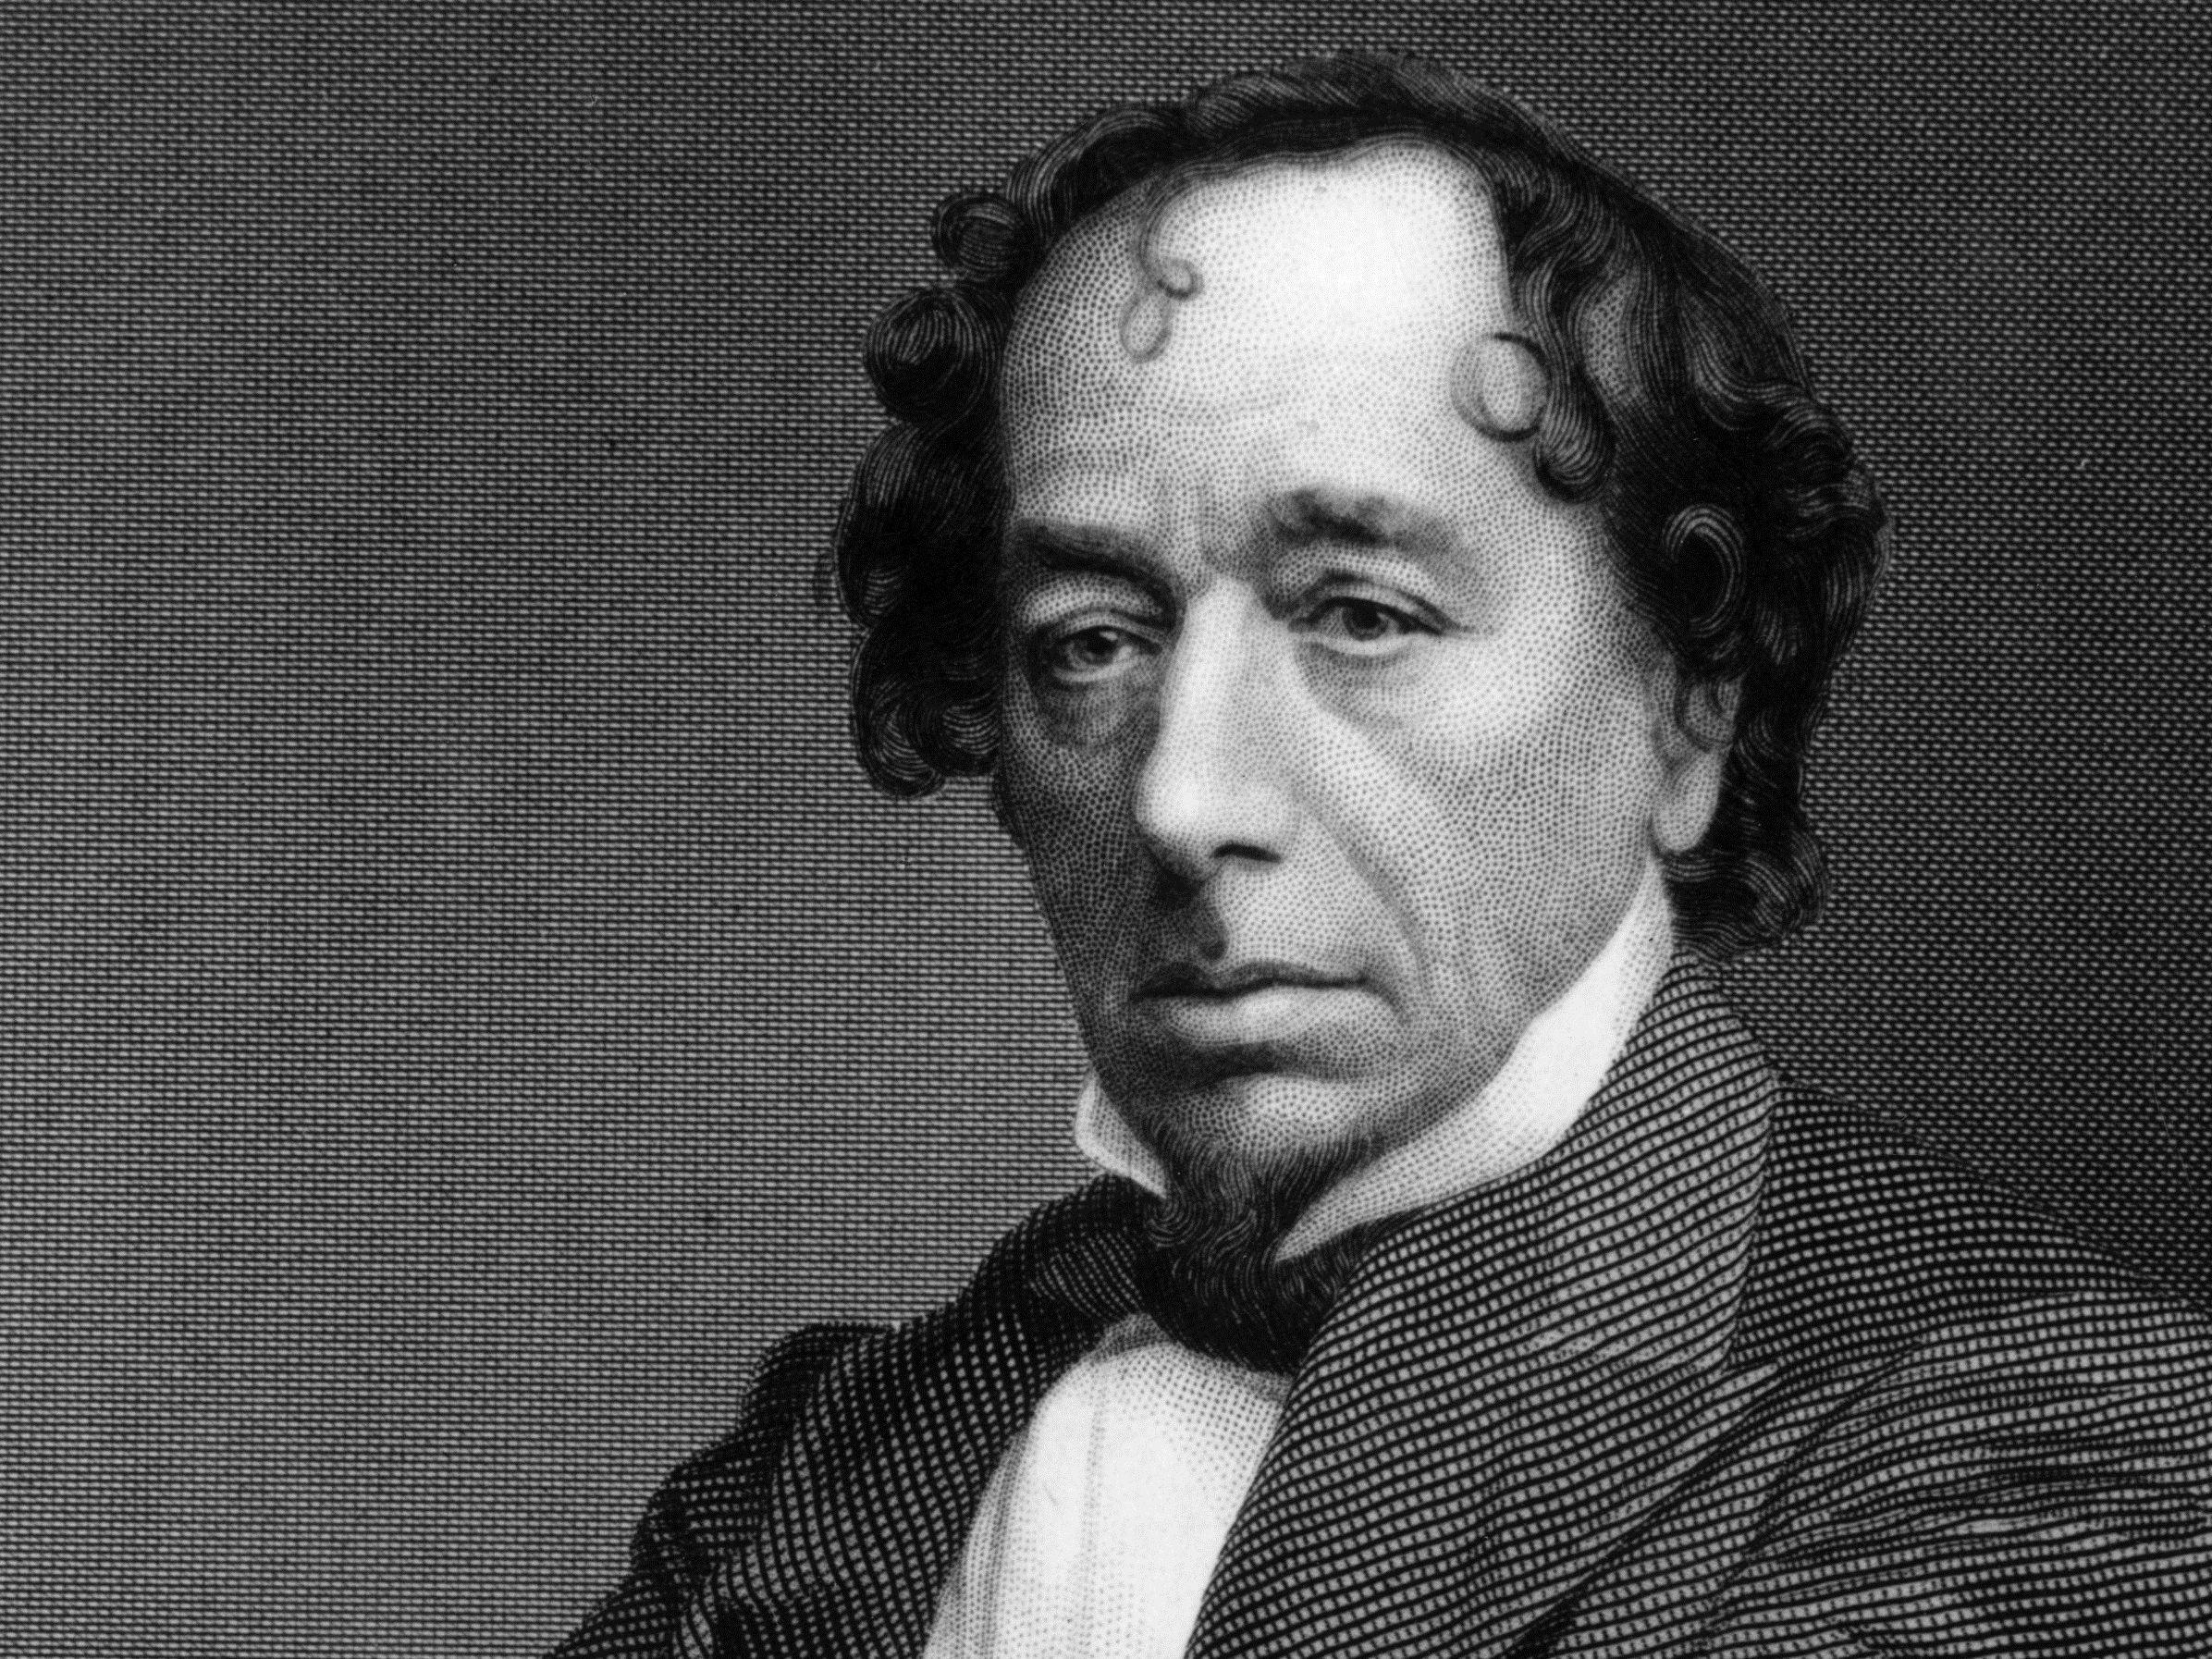 Benjamin Disraeli: Biography of the British Statesman